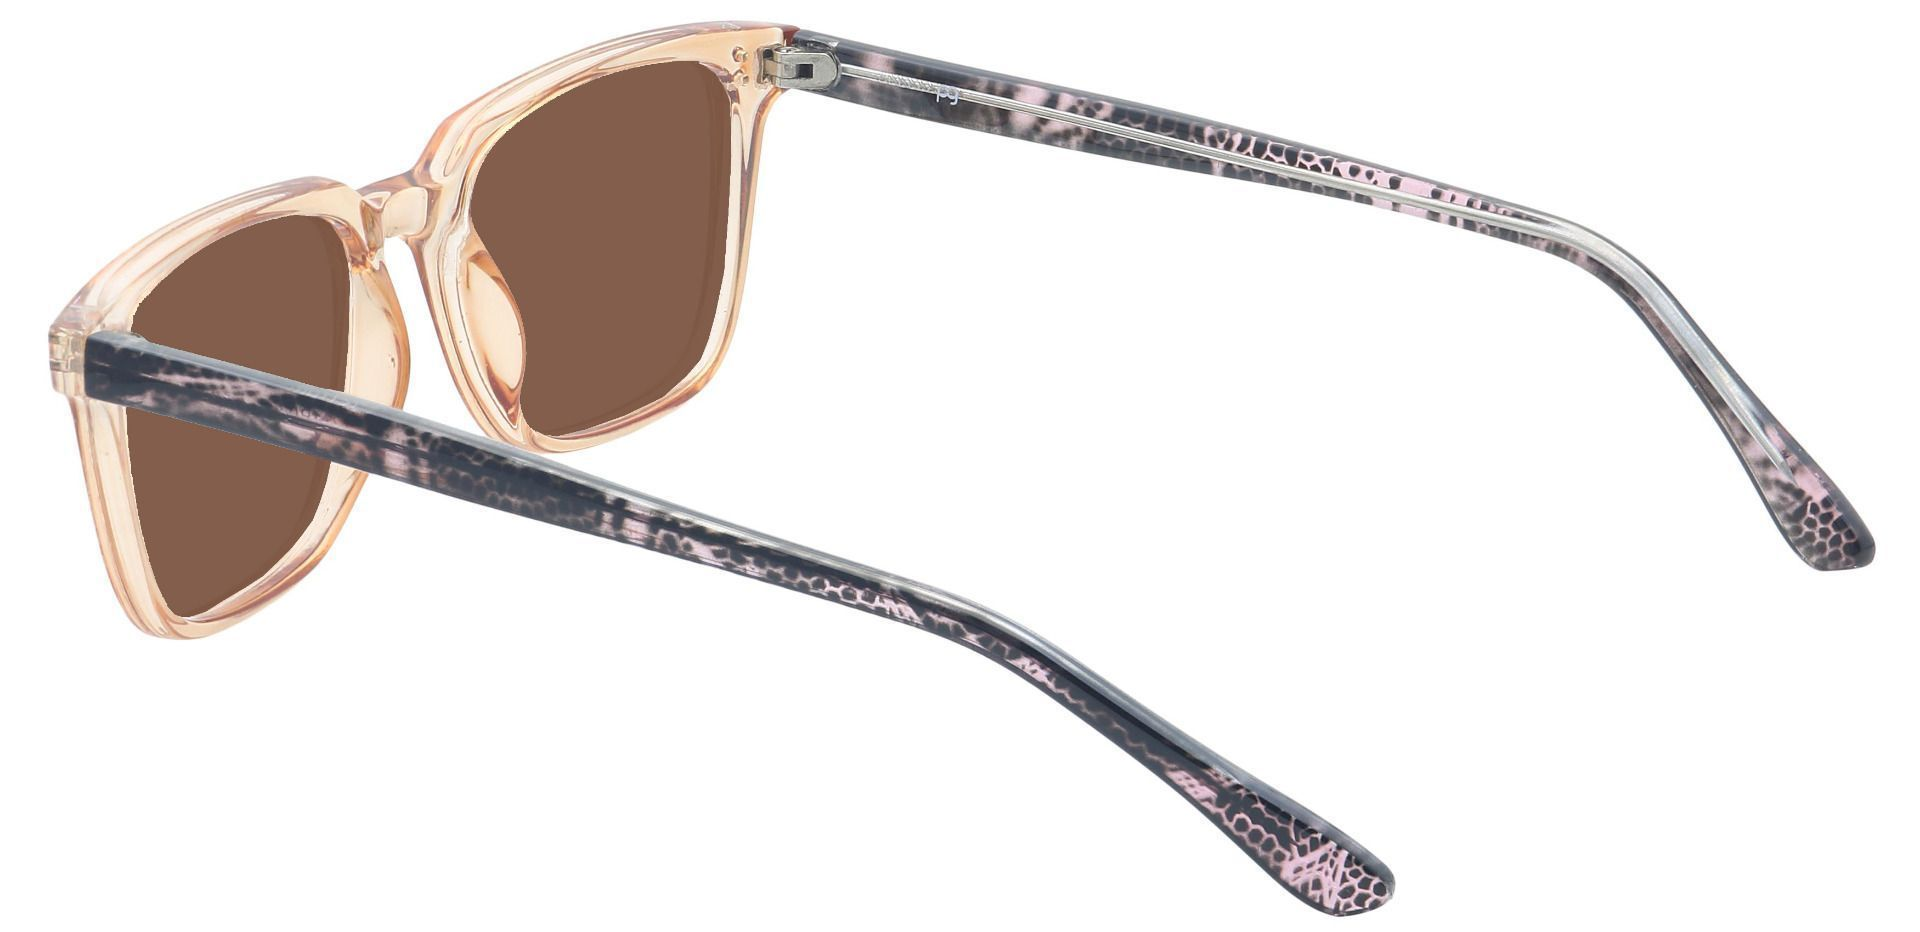 Harper Square Prescription Sunglasses - Brown Frame With Brown Lenses